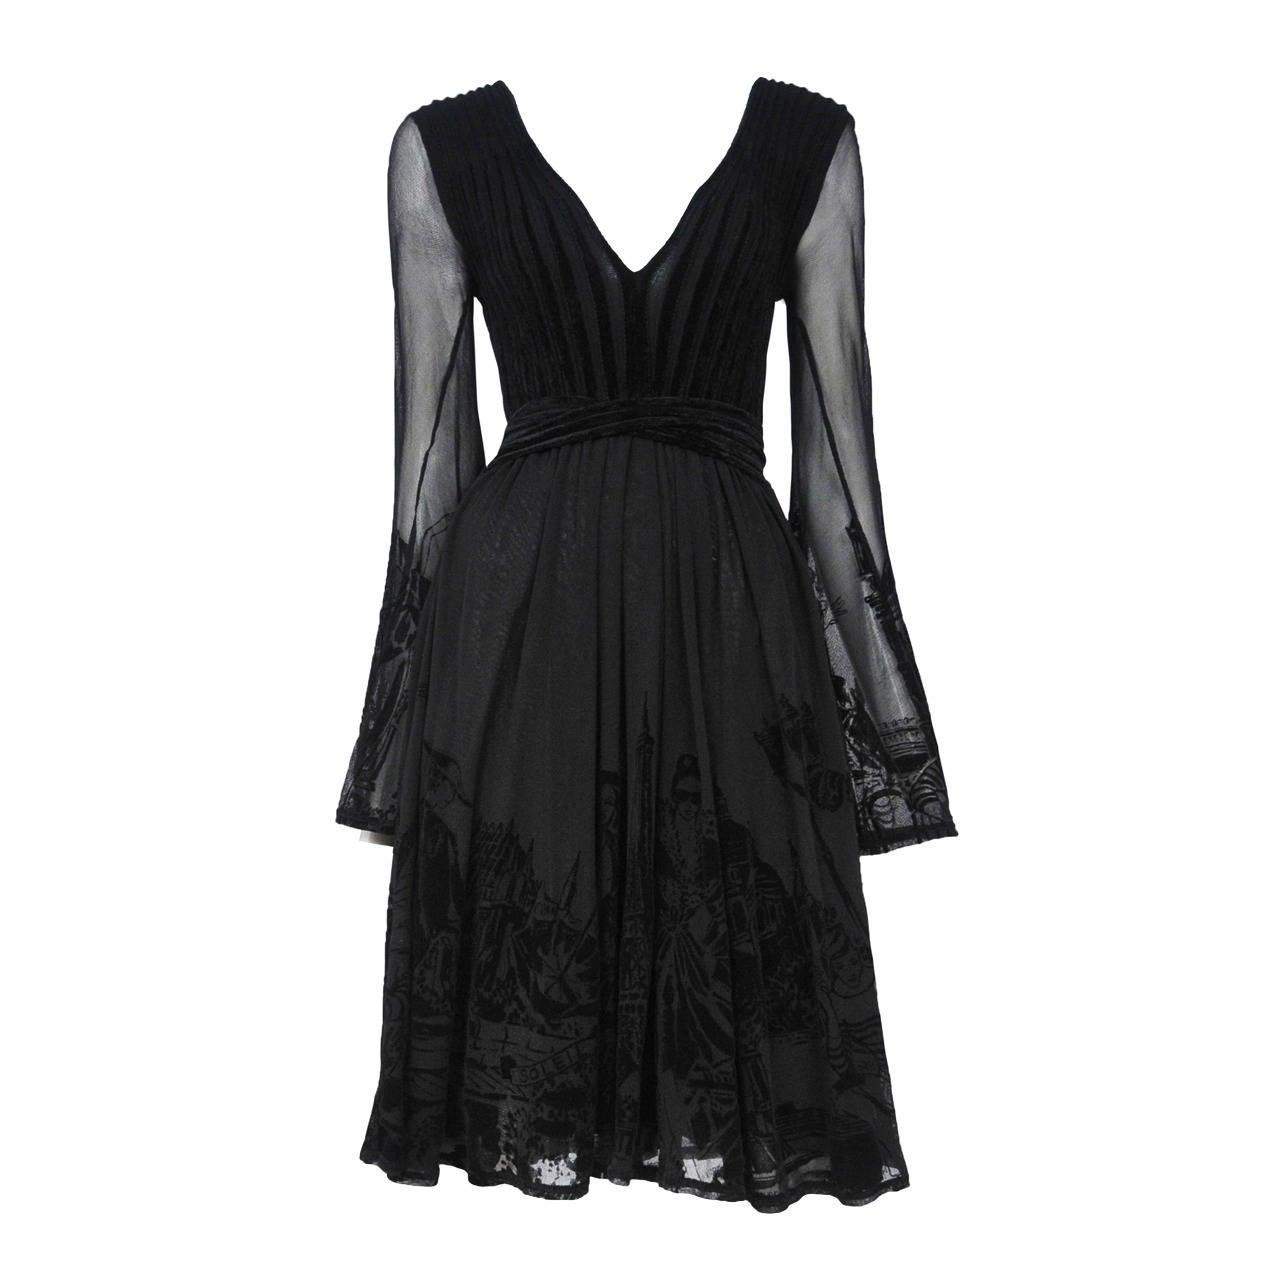 Gaultier Burnout Dress 1